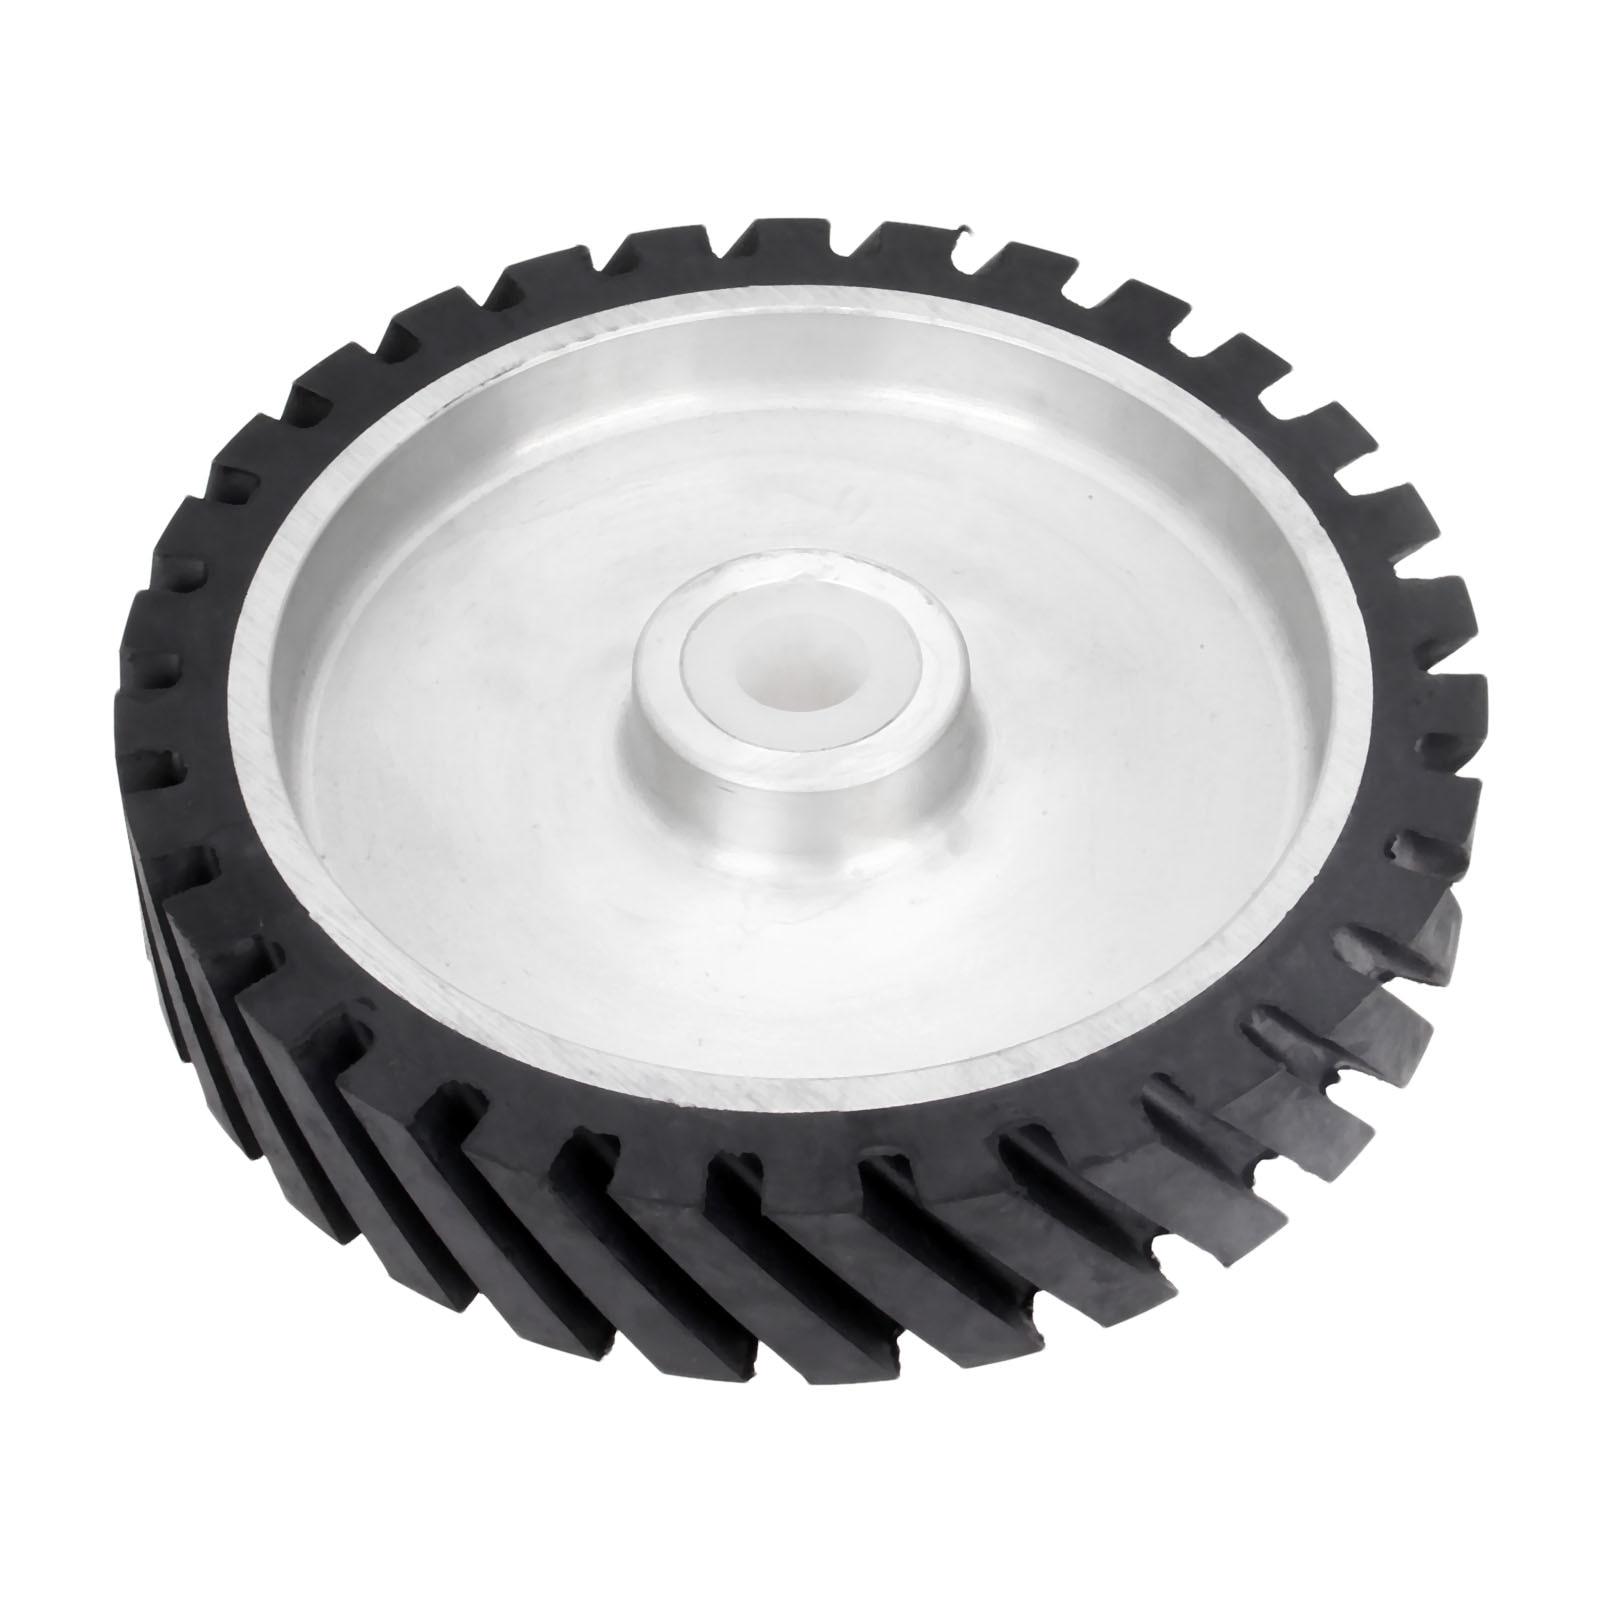 DRELD 250 50mm Serrated Belt Grinder Rubber Contact Wheel 47mm Dia for Abrasive Sanding Belt Polishing